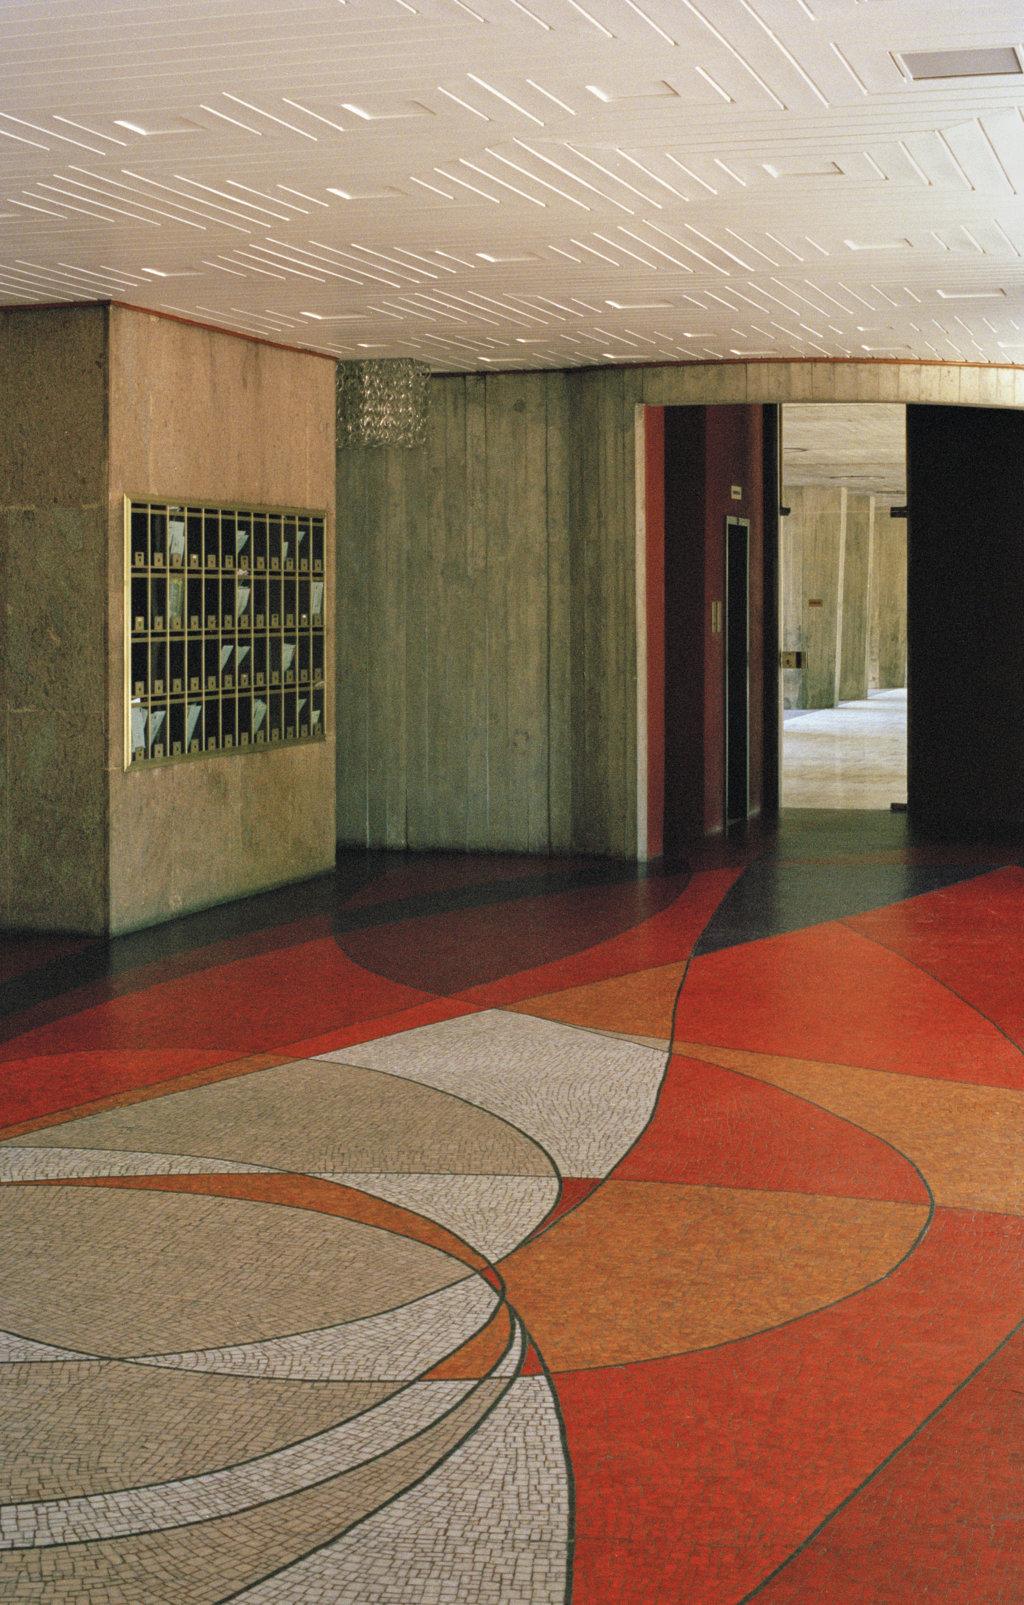 milano-architettura-003 -ph_stefan-giftthaler-livingcorriere